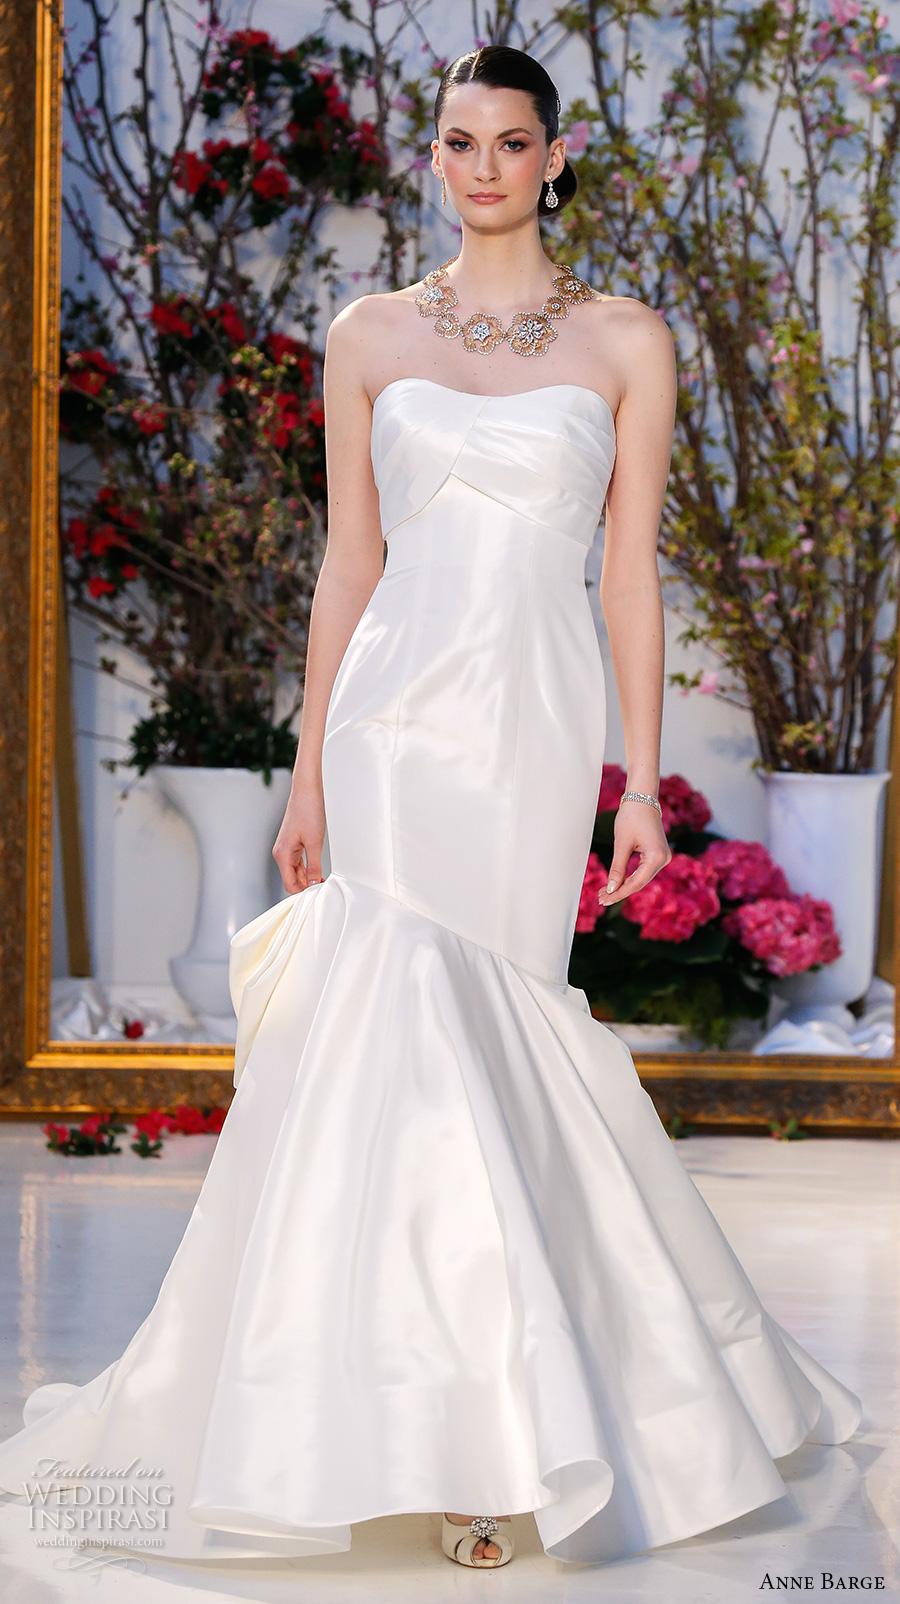 Sweetheart Neckline Mermaid Style Wedding Dresses 78 Cute anne barge spring bridal